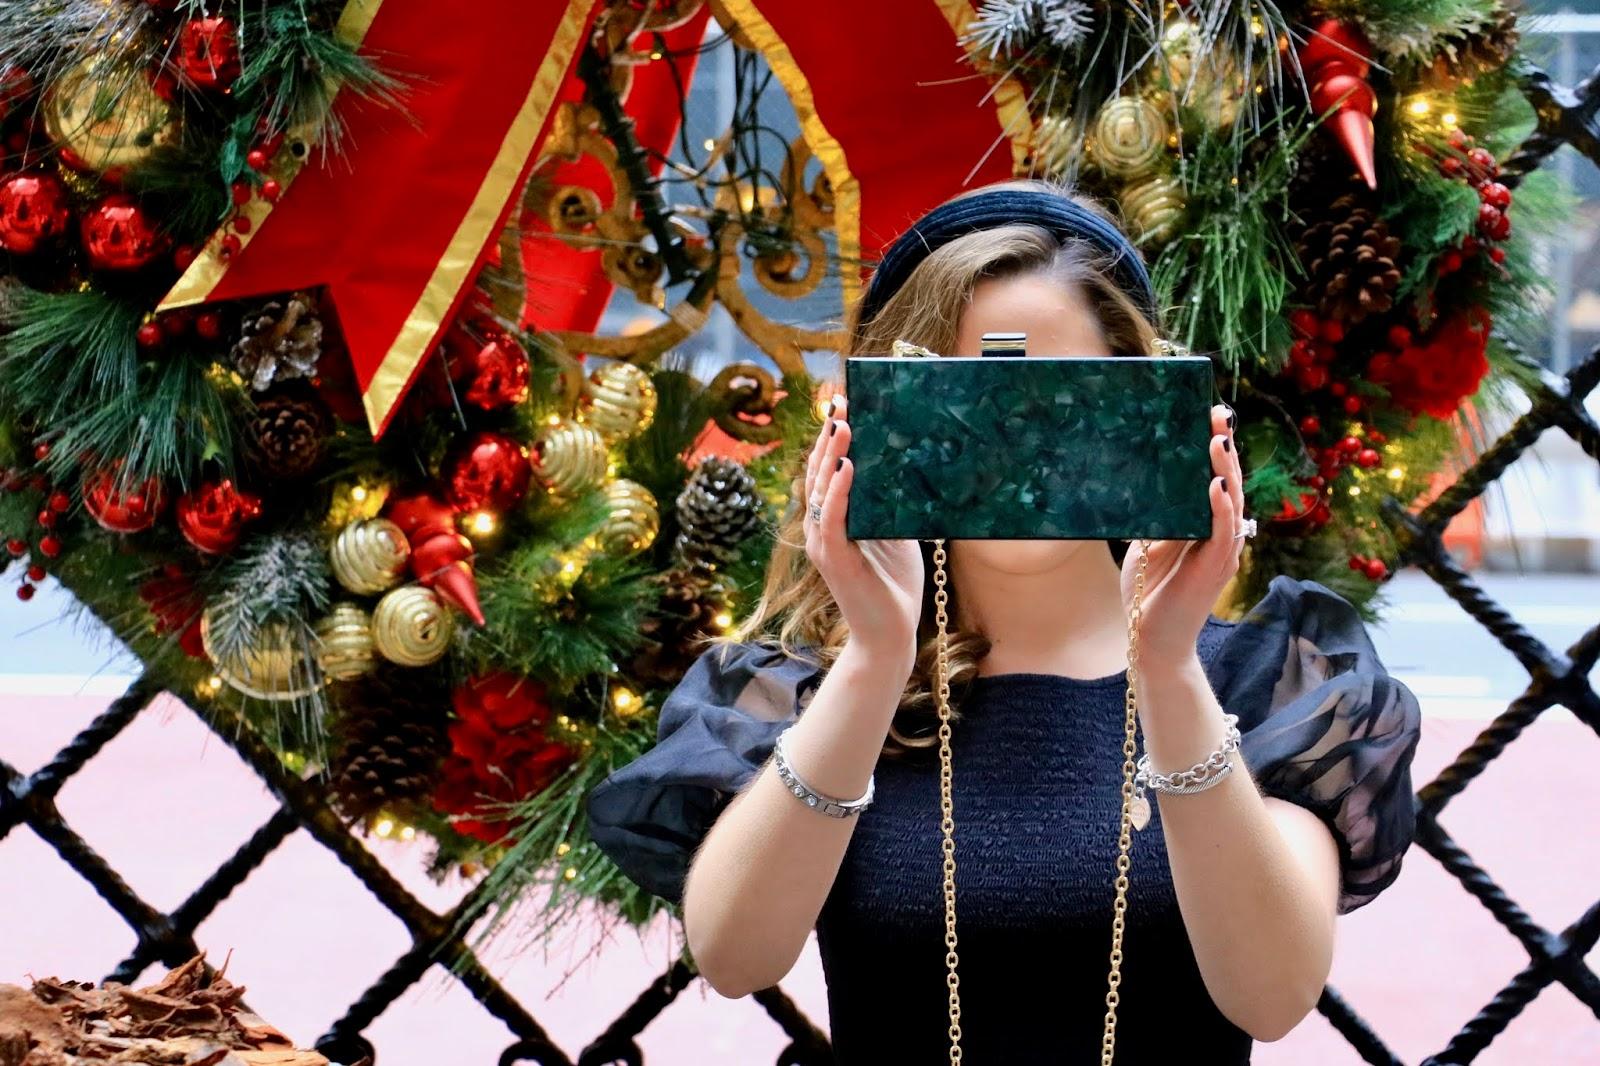 Nyc fashion blogger Kathleen Harper's green plastic box purse.